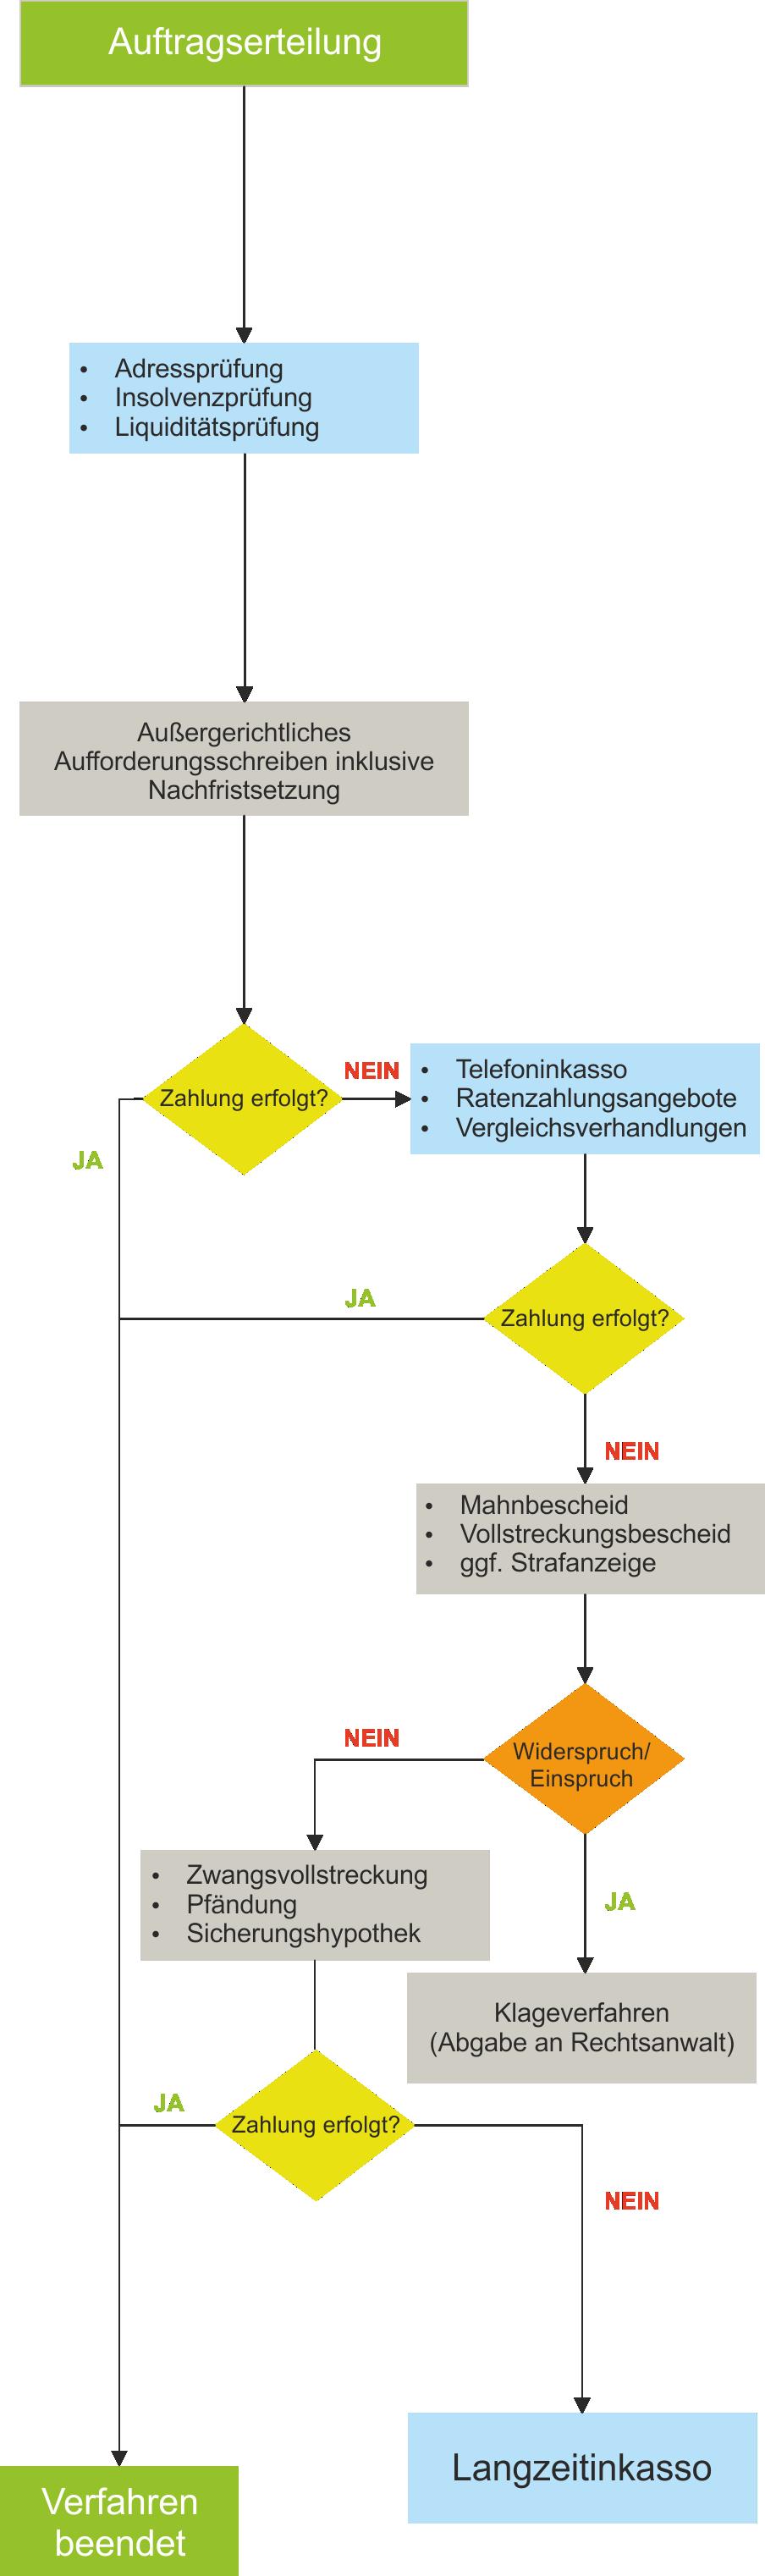 Inkasso Flussdiagramm